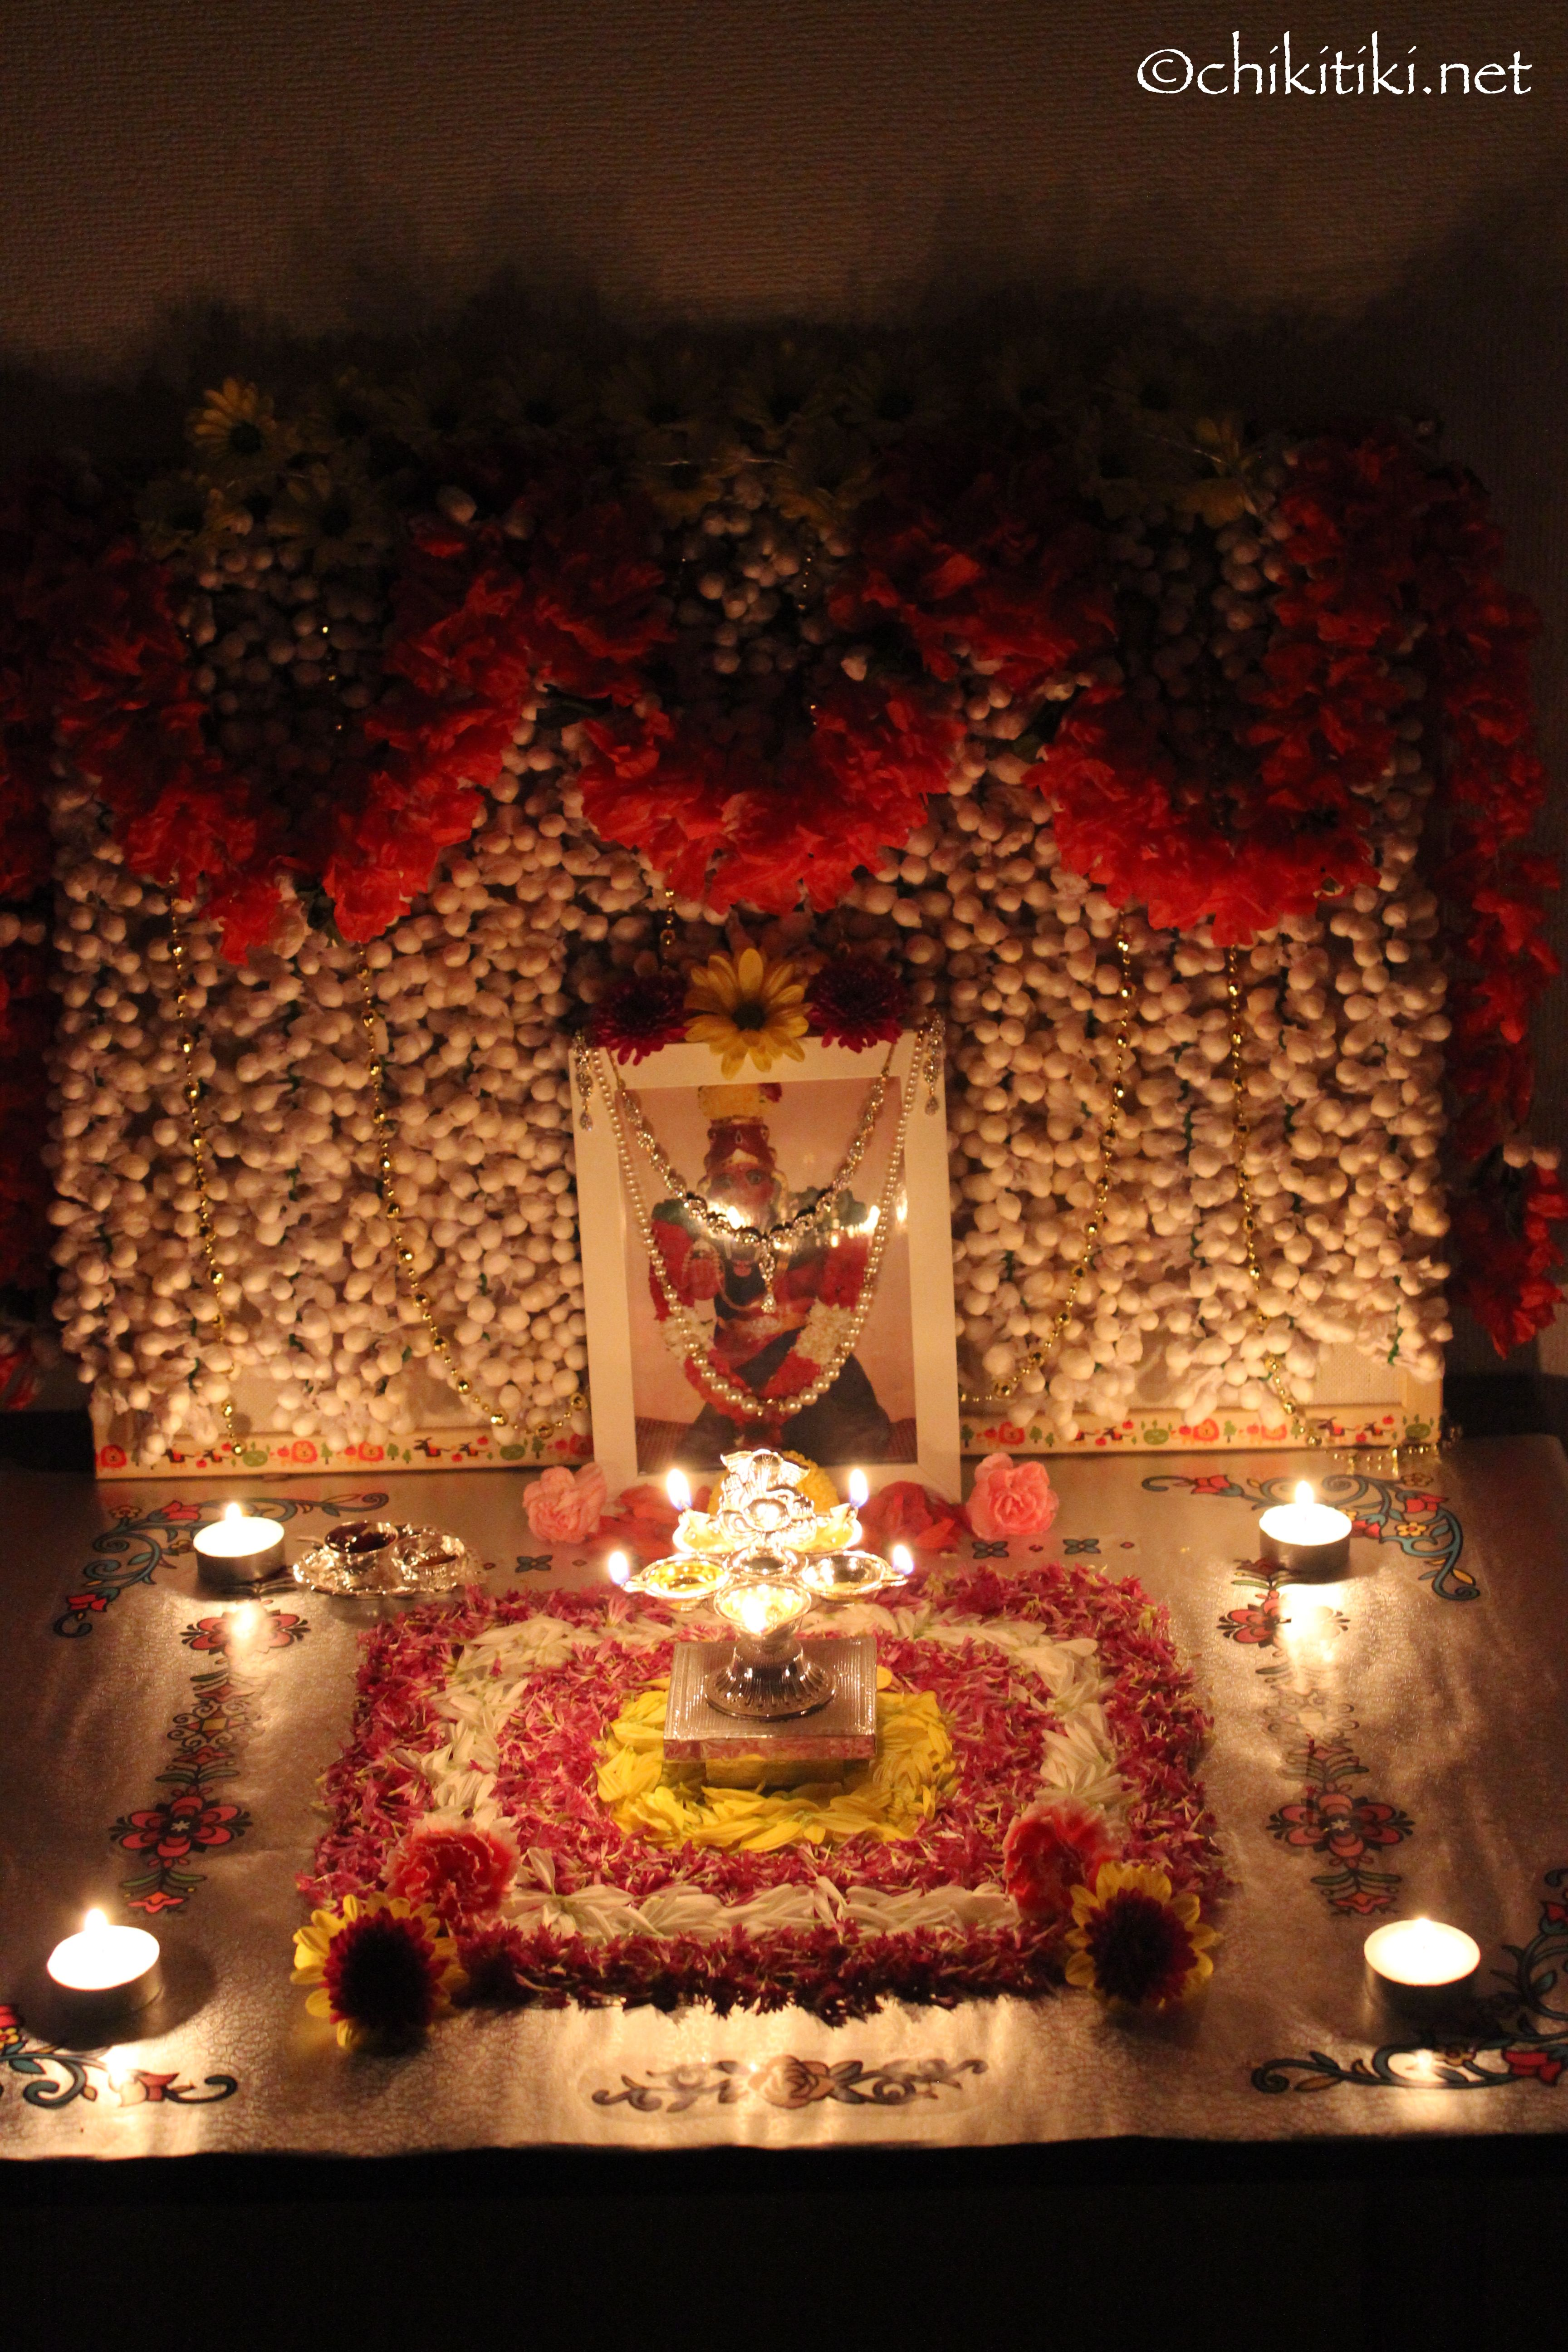 Diwali 2015 Diwali, Diya lamp